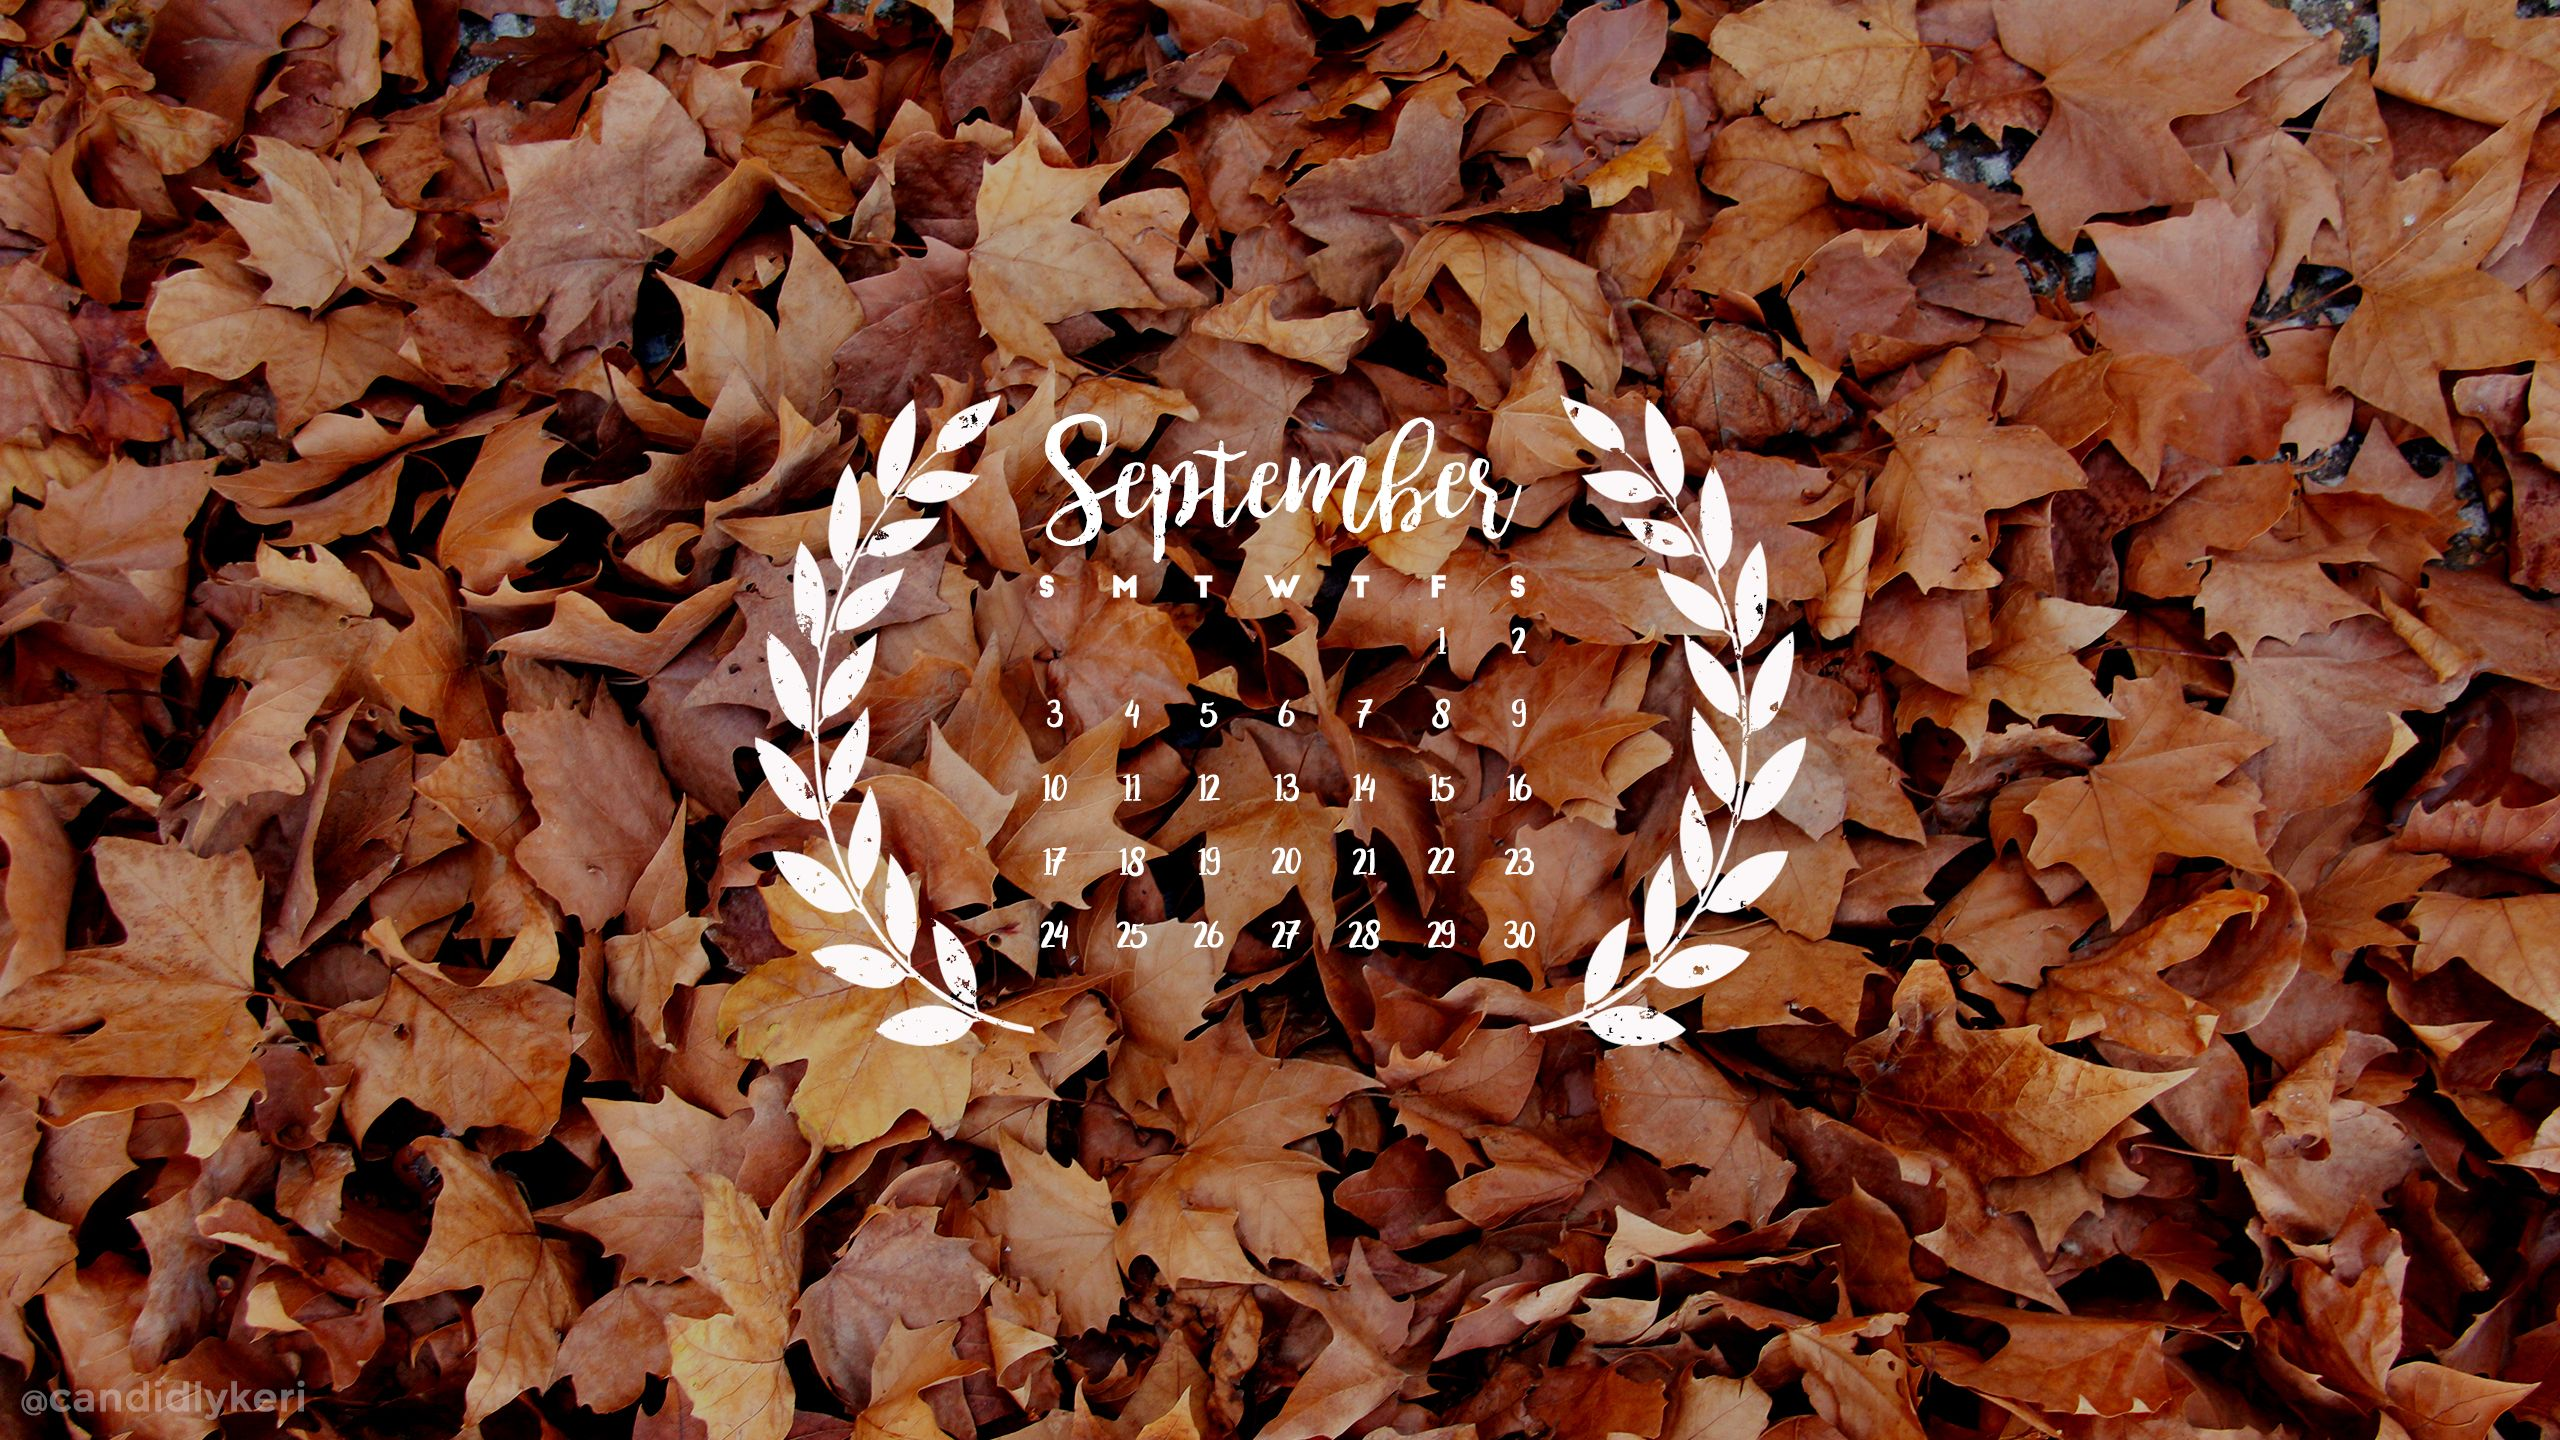 2017 September9 Jpg 2560 1440 Desktop Wallpaper Macbook Desktop Wallpaper Fall September Wallpaper